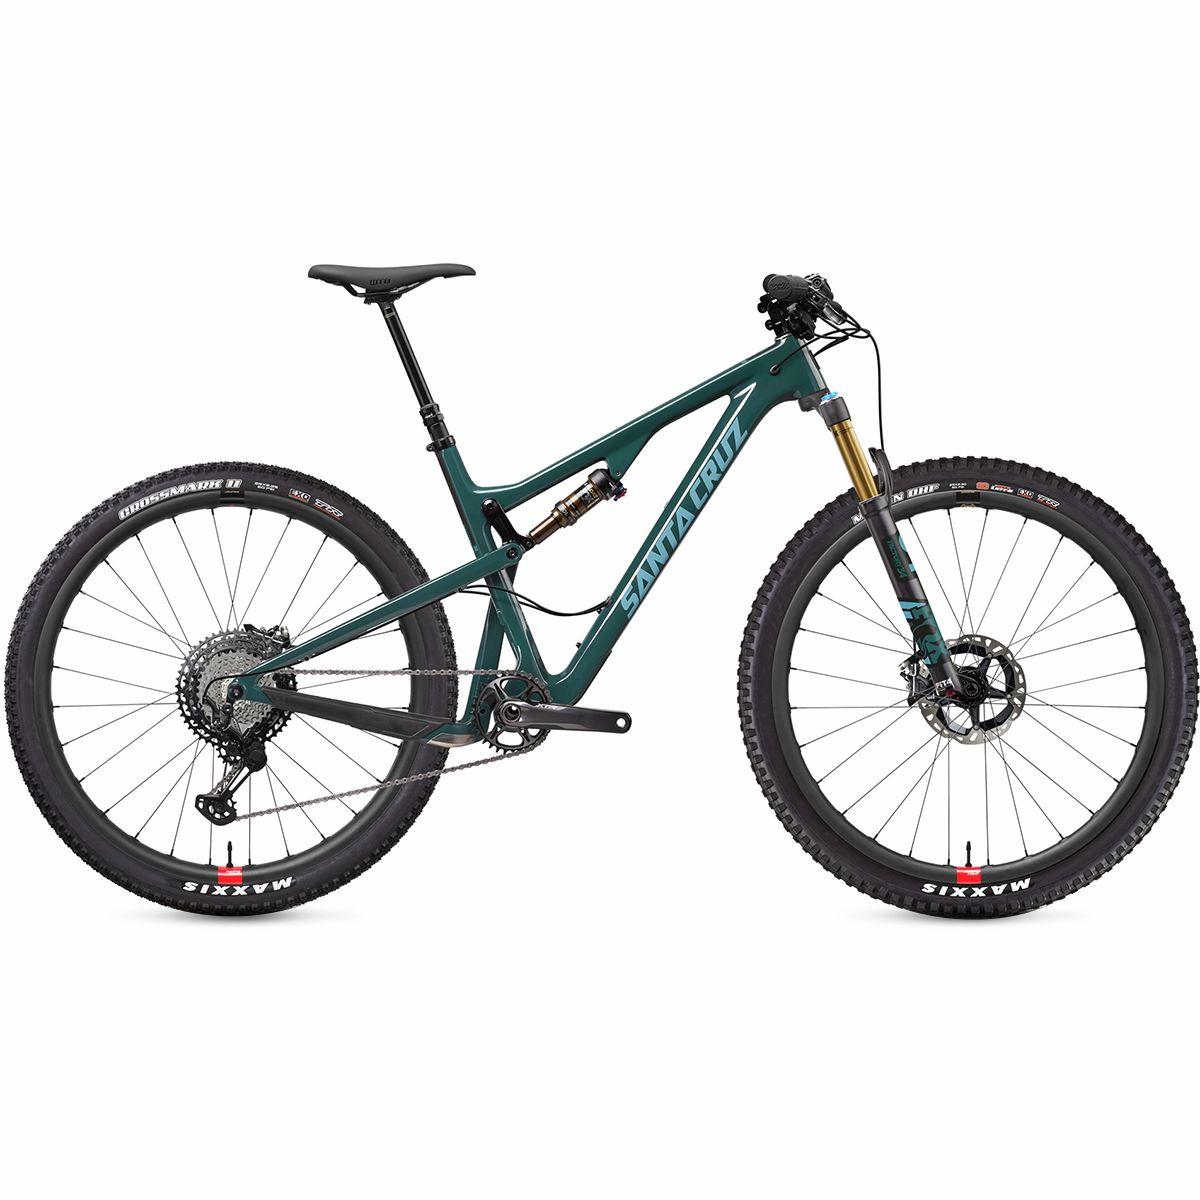 Santa Cruz Bicycles Tallboy Carbon CC XTR Reserve Complete Forest Green